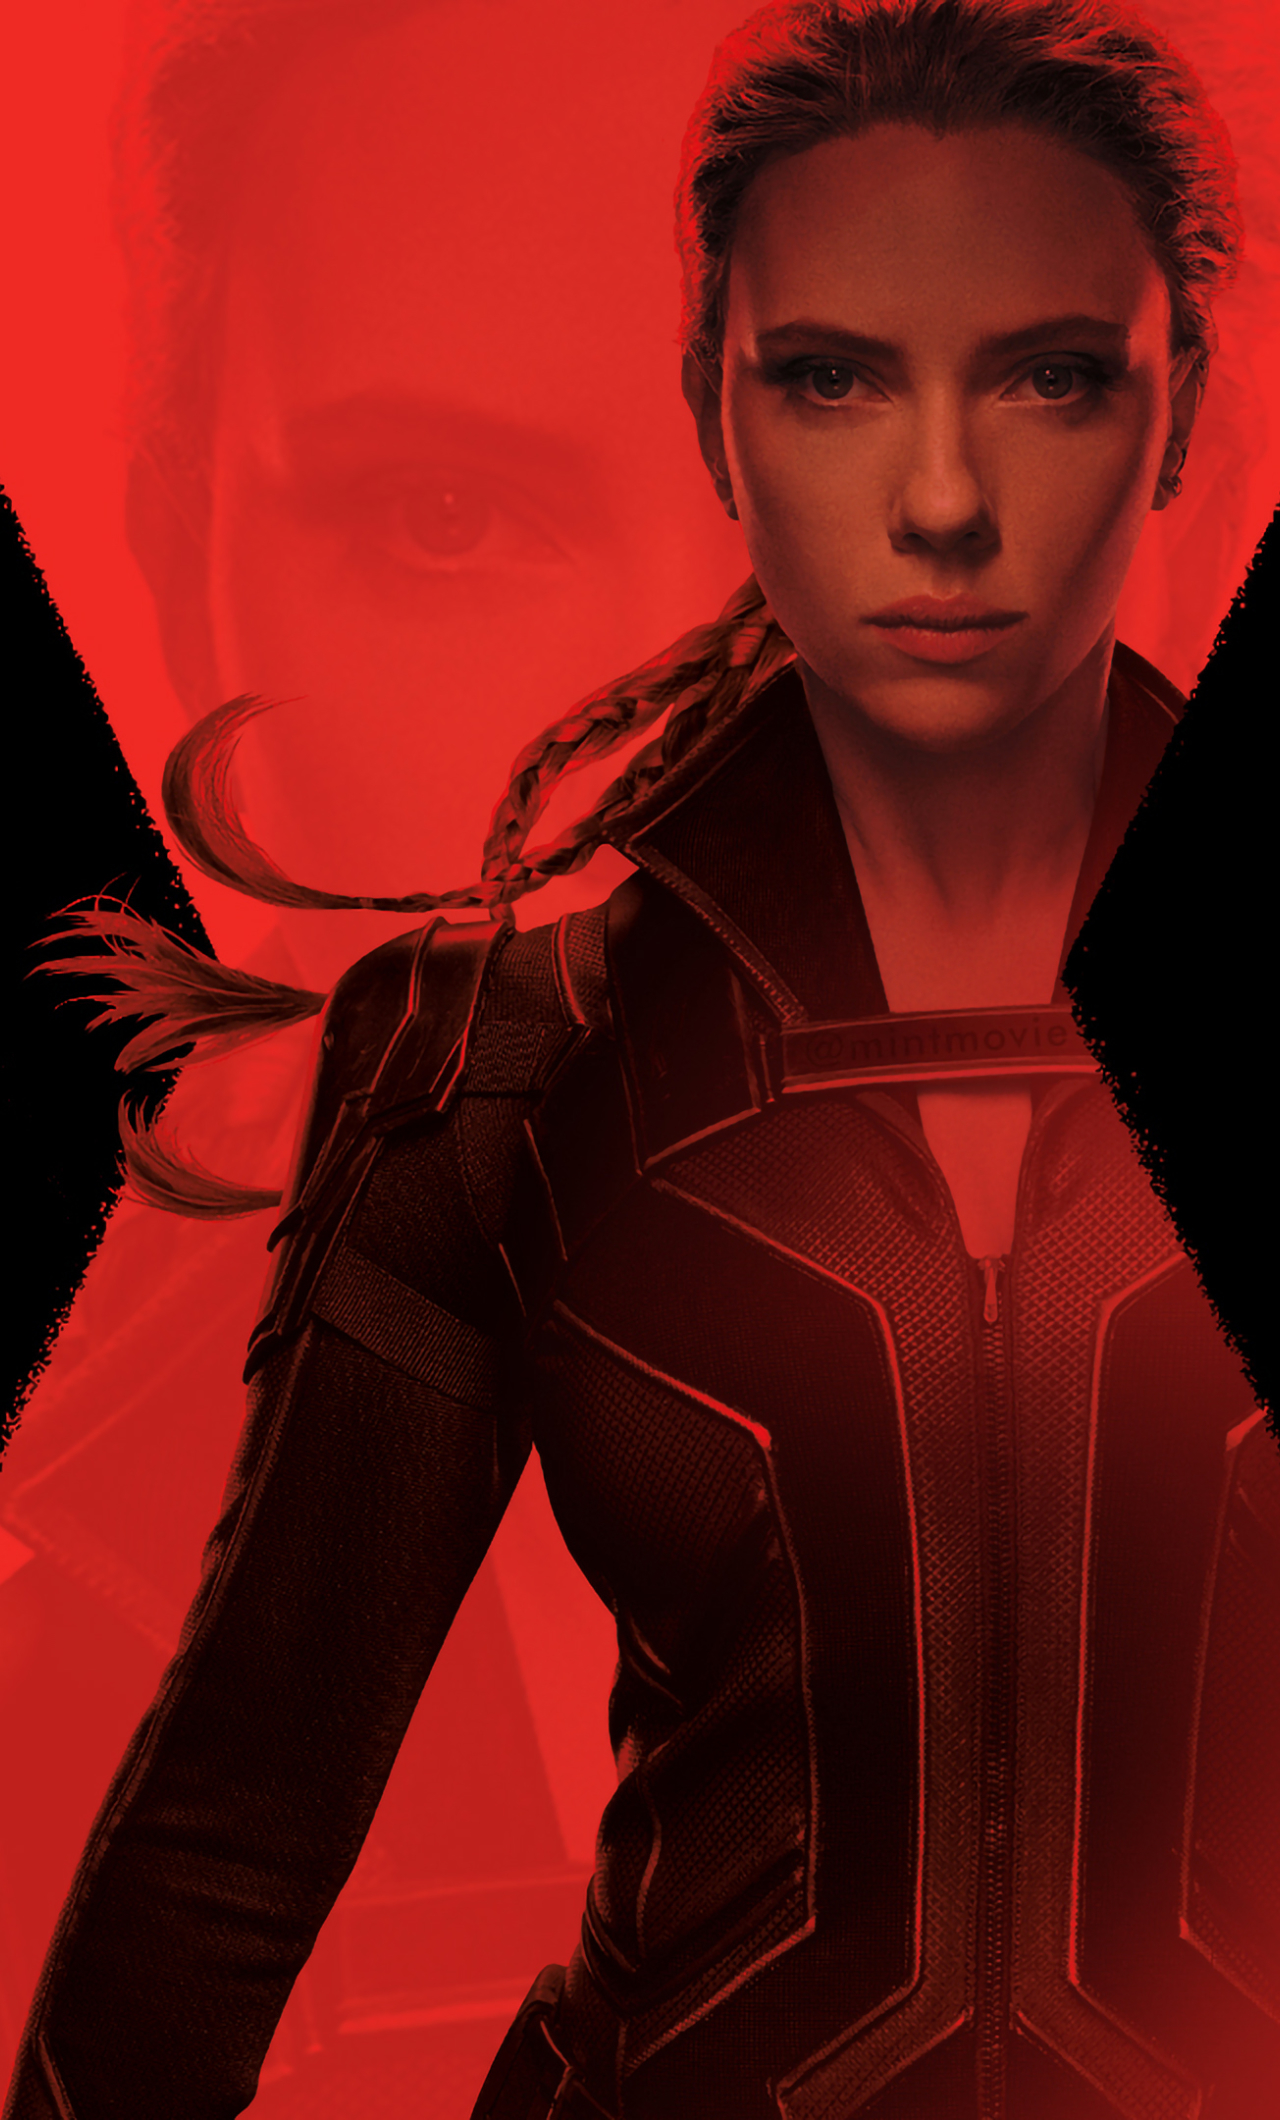 1280x2120 4K Black Widow Movie iPhone 6 plus Wallpaper, HD ...